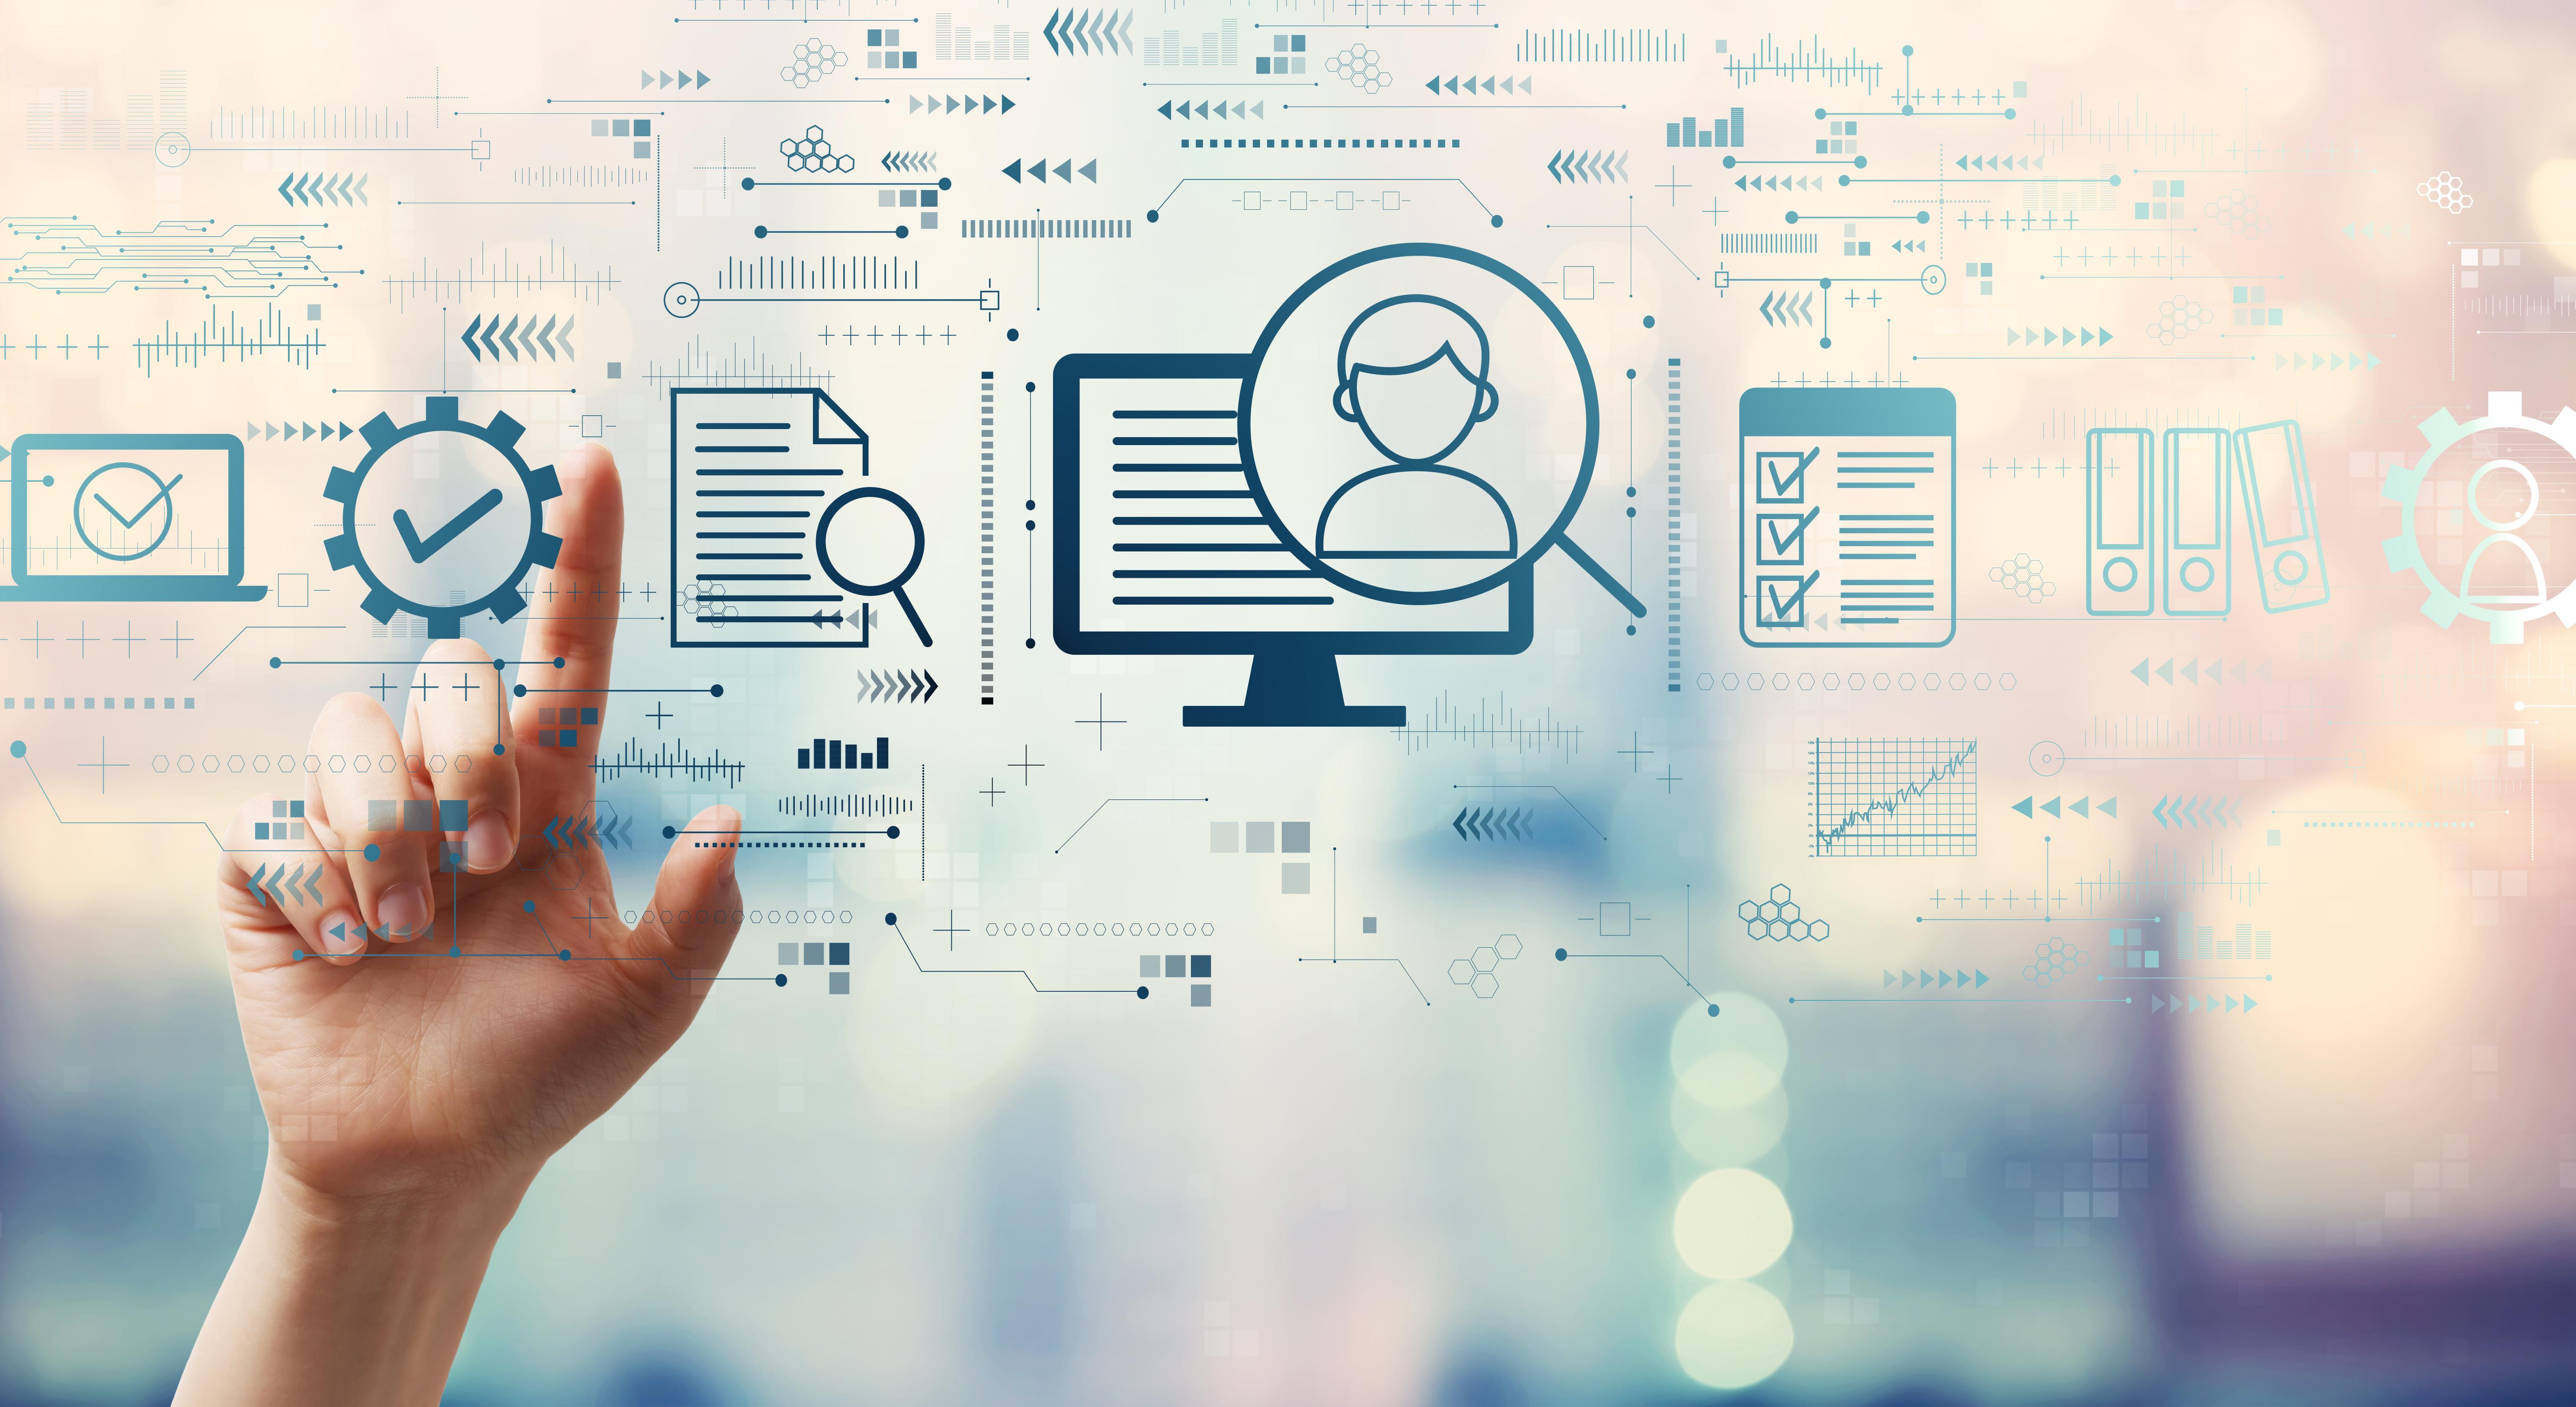 SalesVista Technology Comp Plans Image